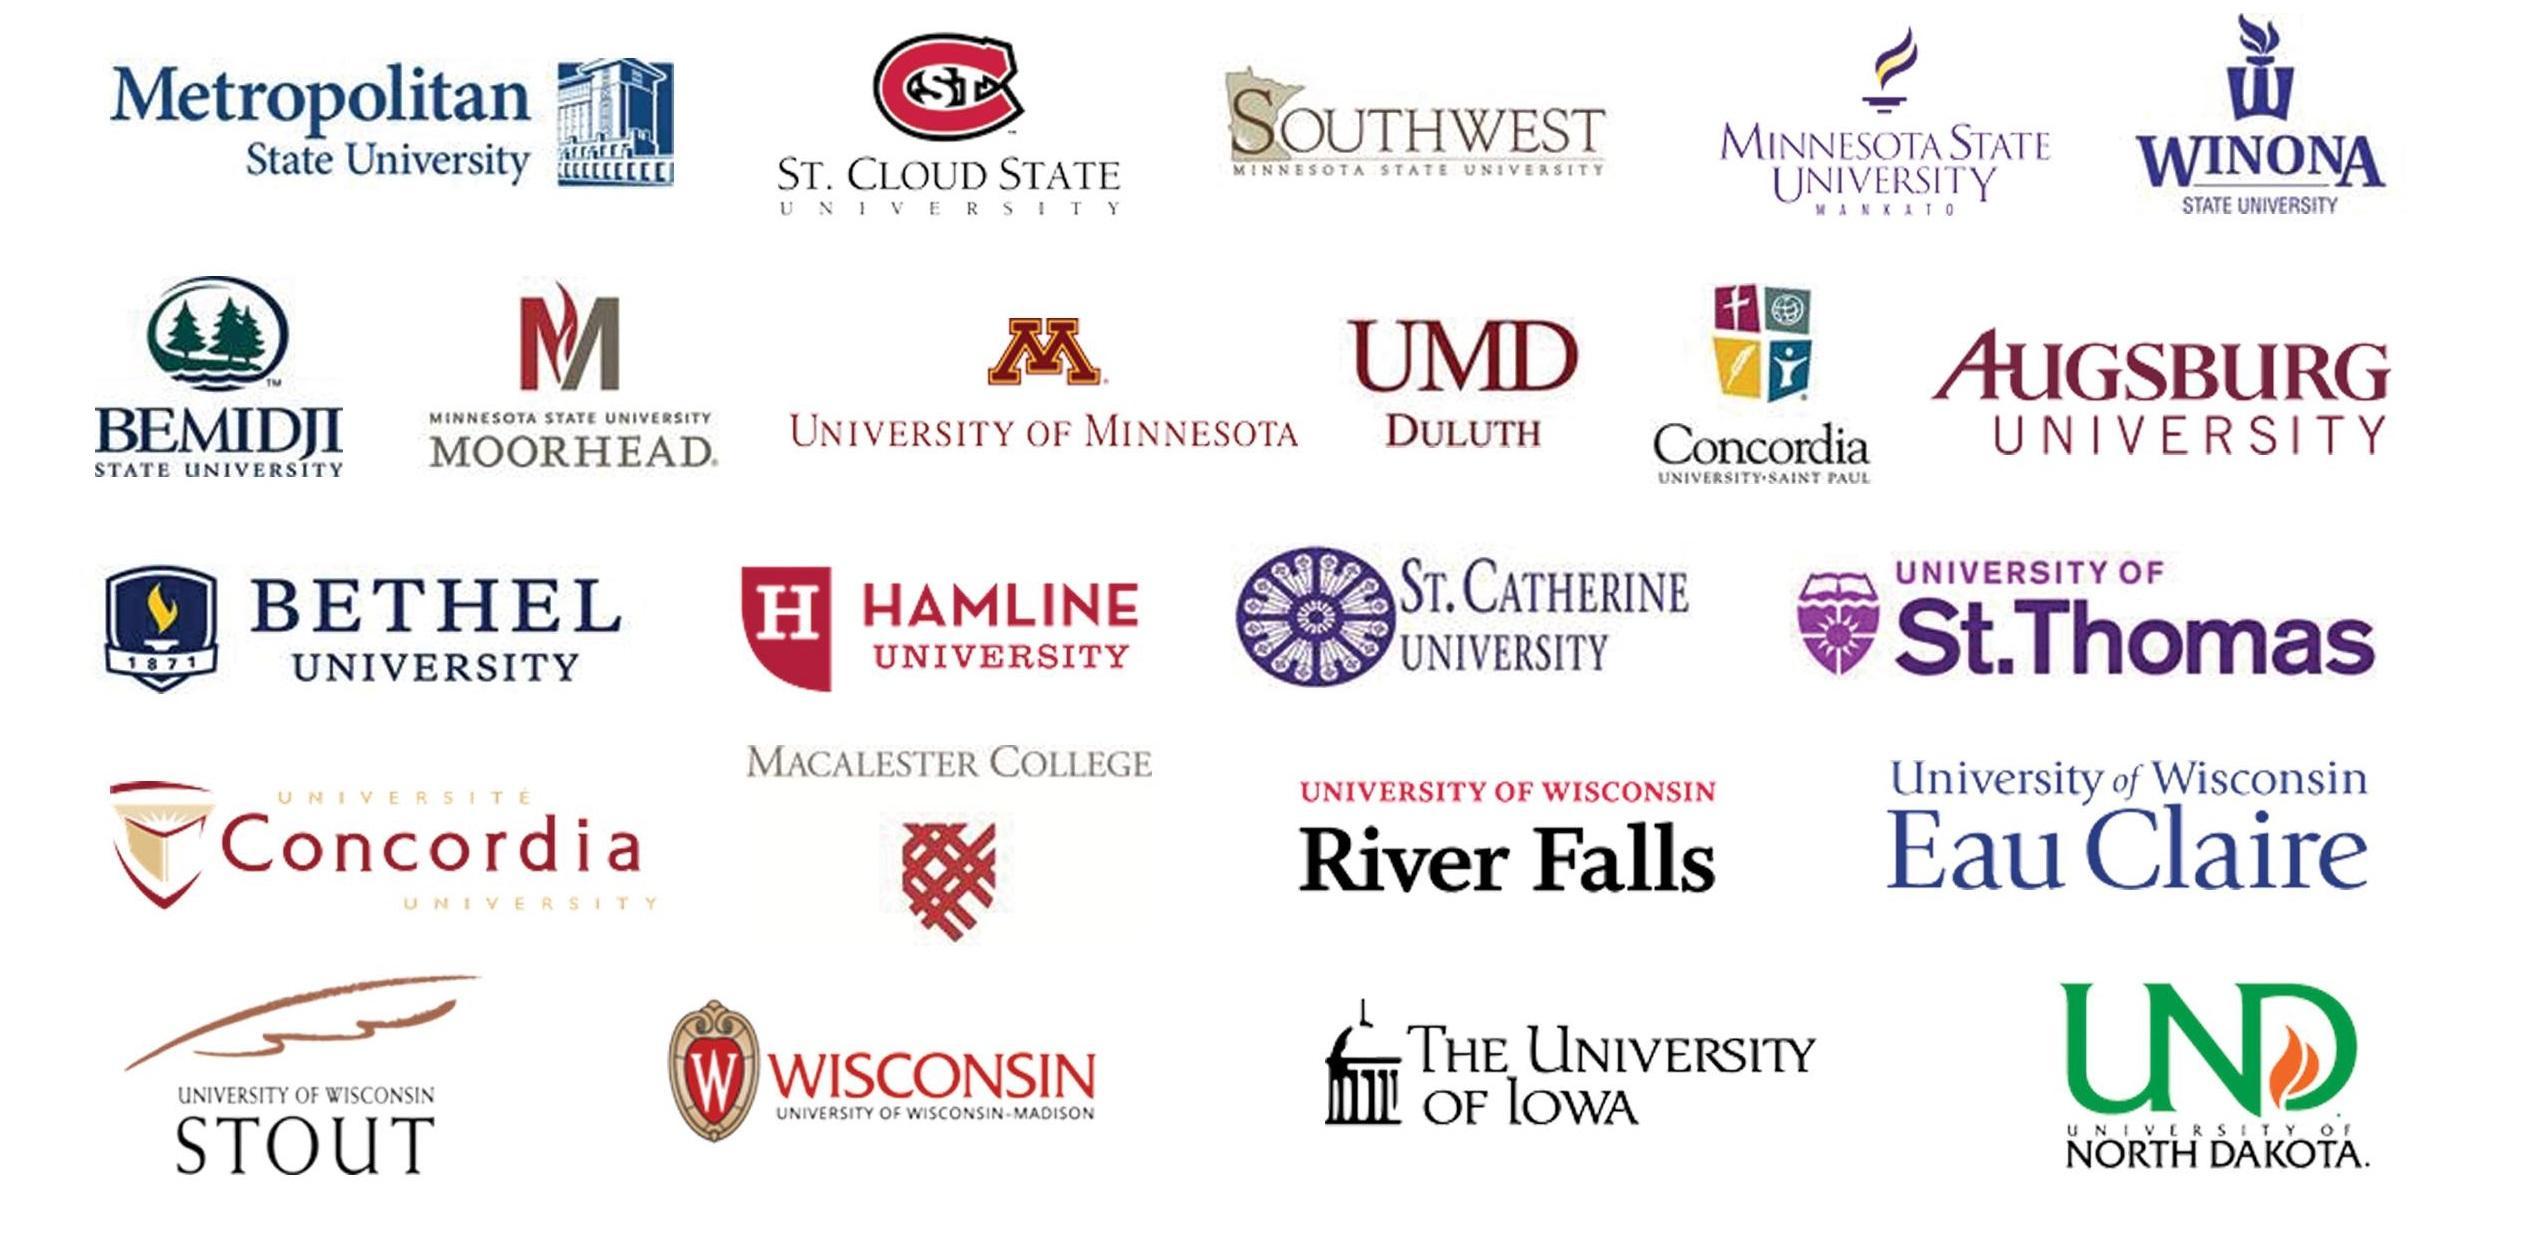 Summer Semester Four-Year Logos